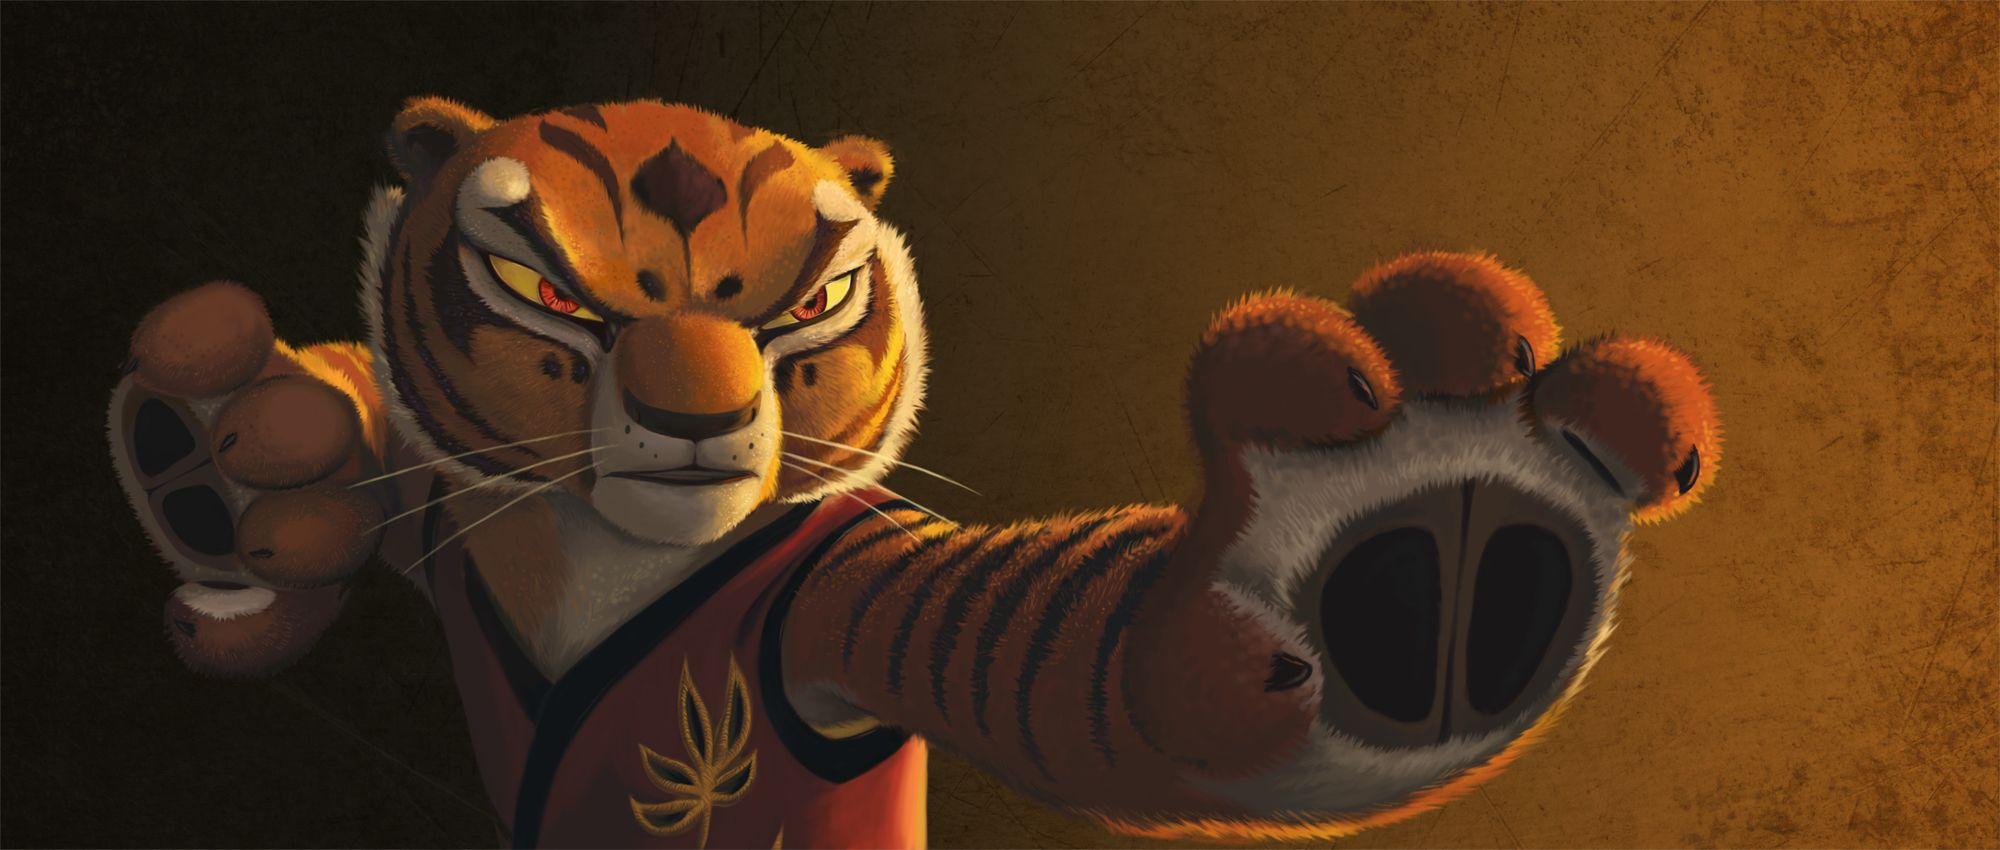 Tigress kung fu panda, Kung fu panda, Disney character